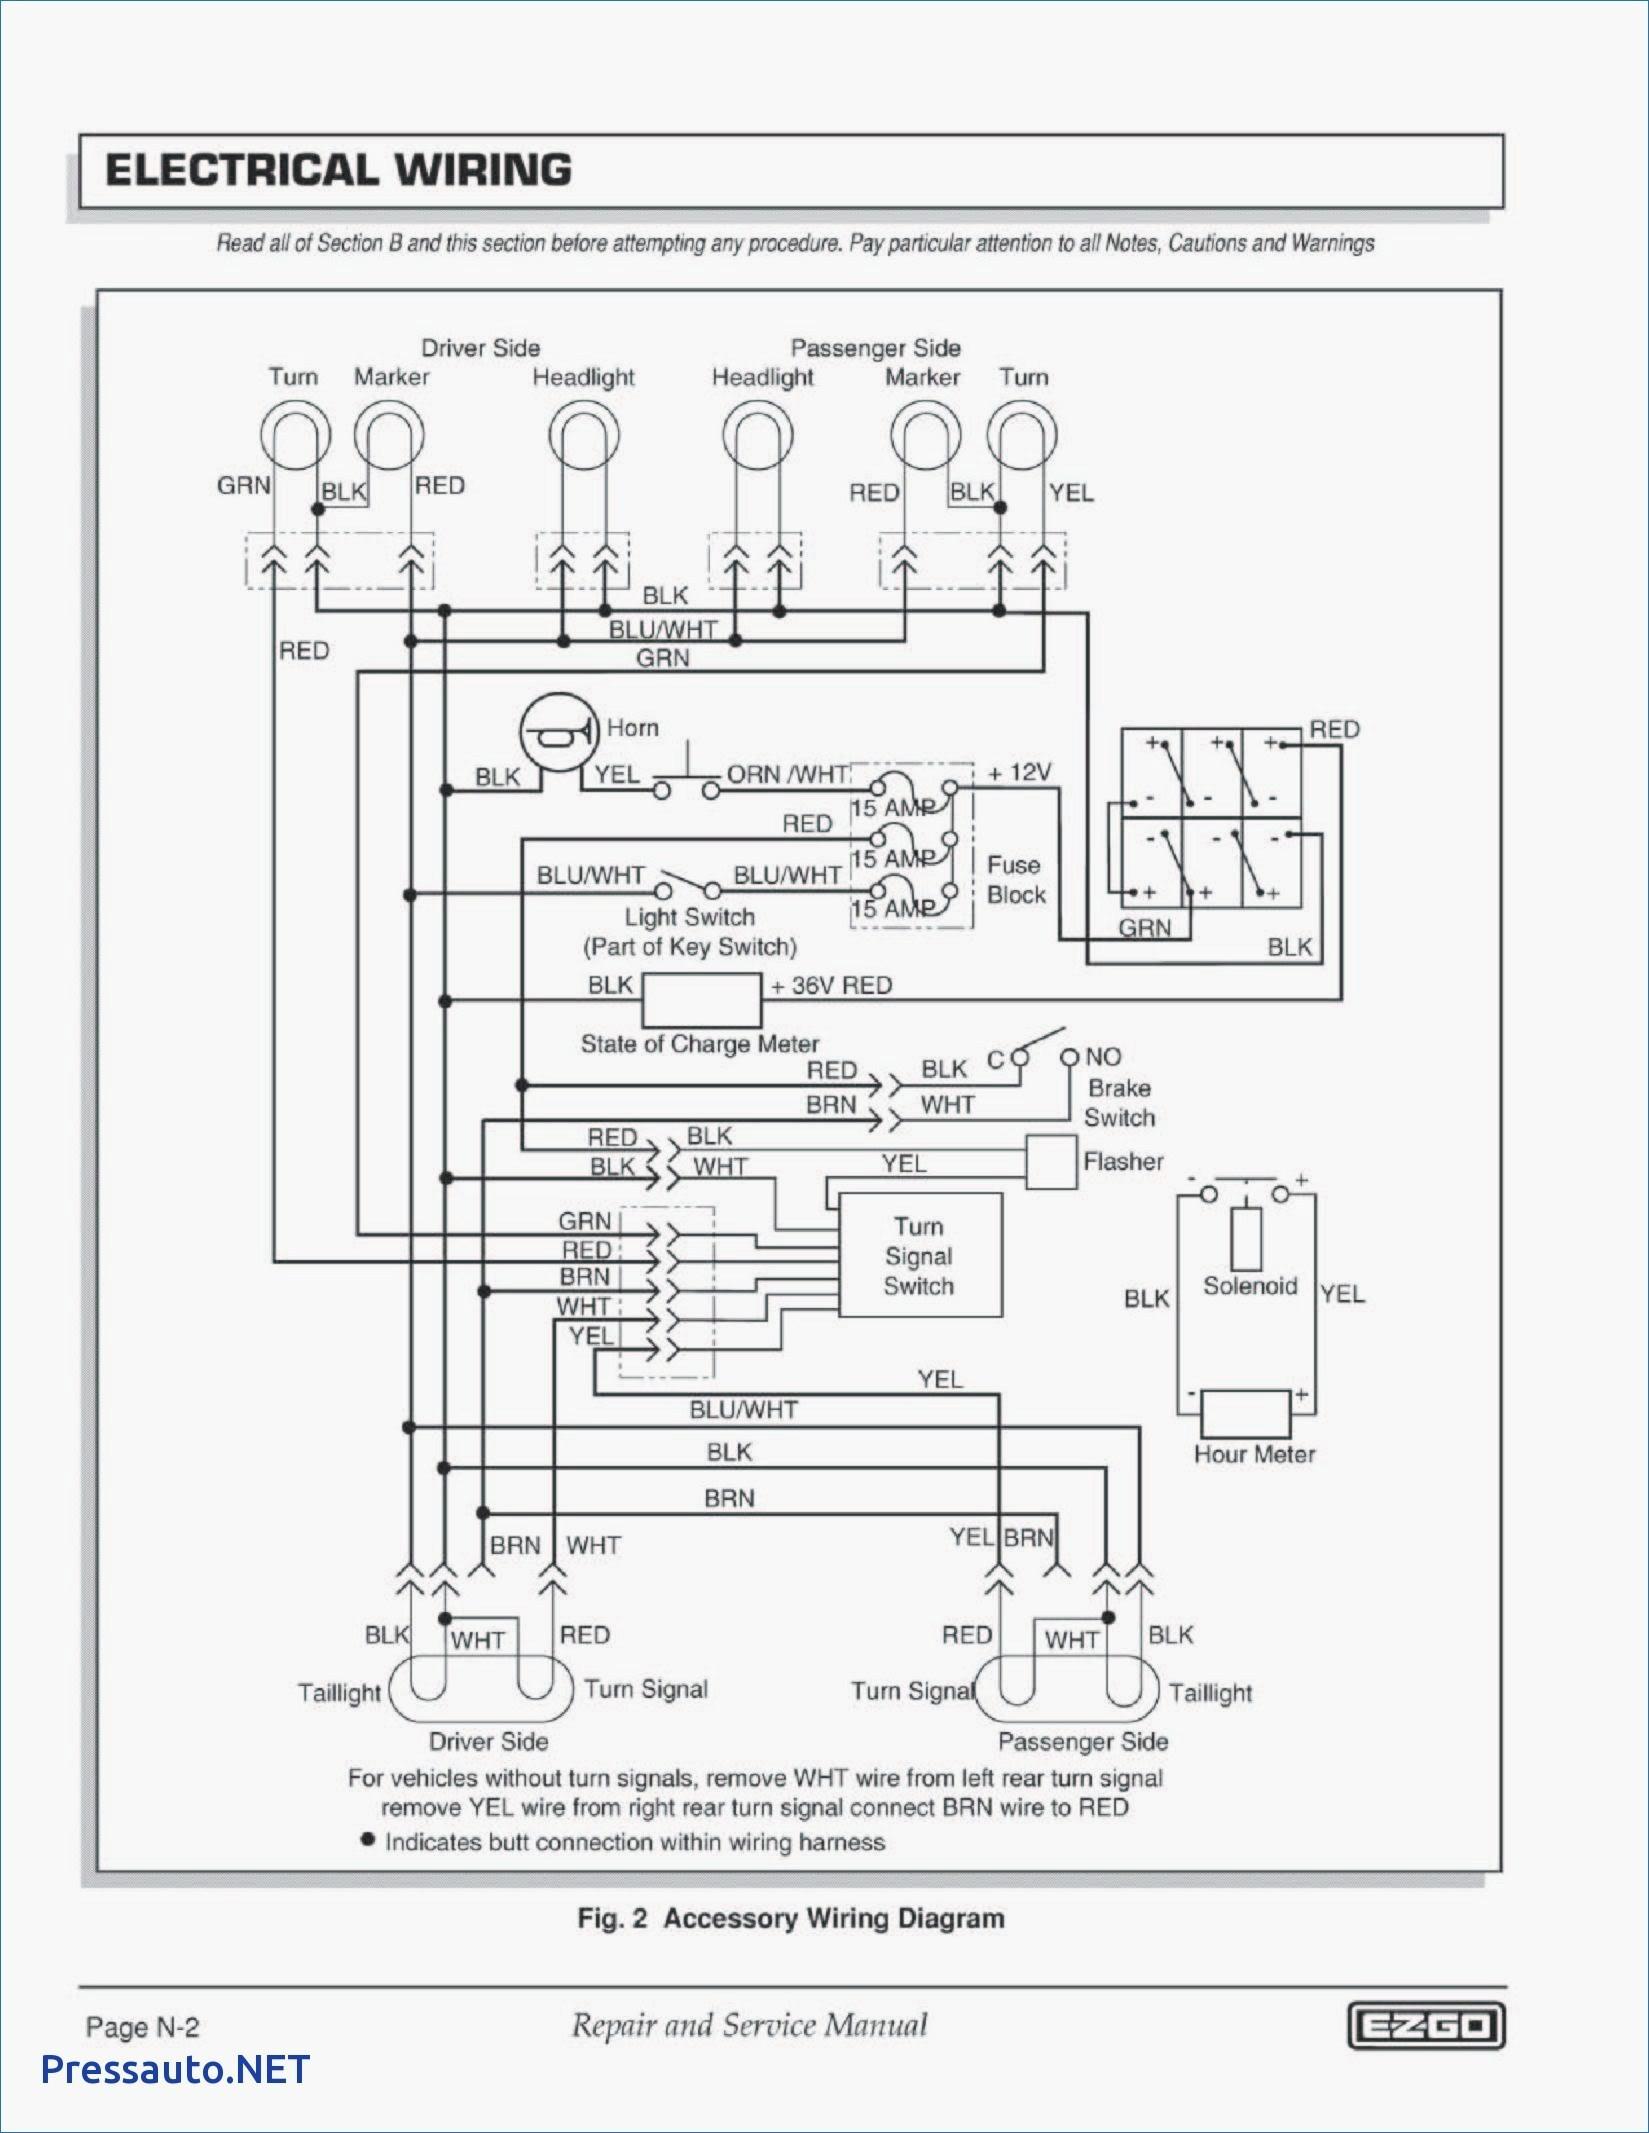 Ez Wiring Diagram - Wiring Diagram 500 on chopper diagrams, auto repair manual diagrams, easy drawings, easy sketches, honda shadow 1100 carburetor diagrams, easy plumbing diagrams, ford manual transmission parts diagrams, basic brake system diagrams, ezgo golf cart parts diagrams, audio transistor circuit diagrams,